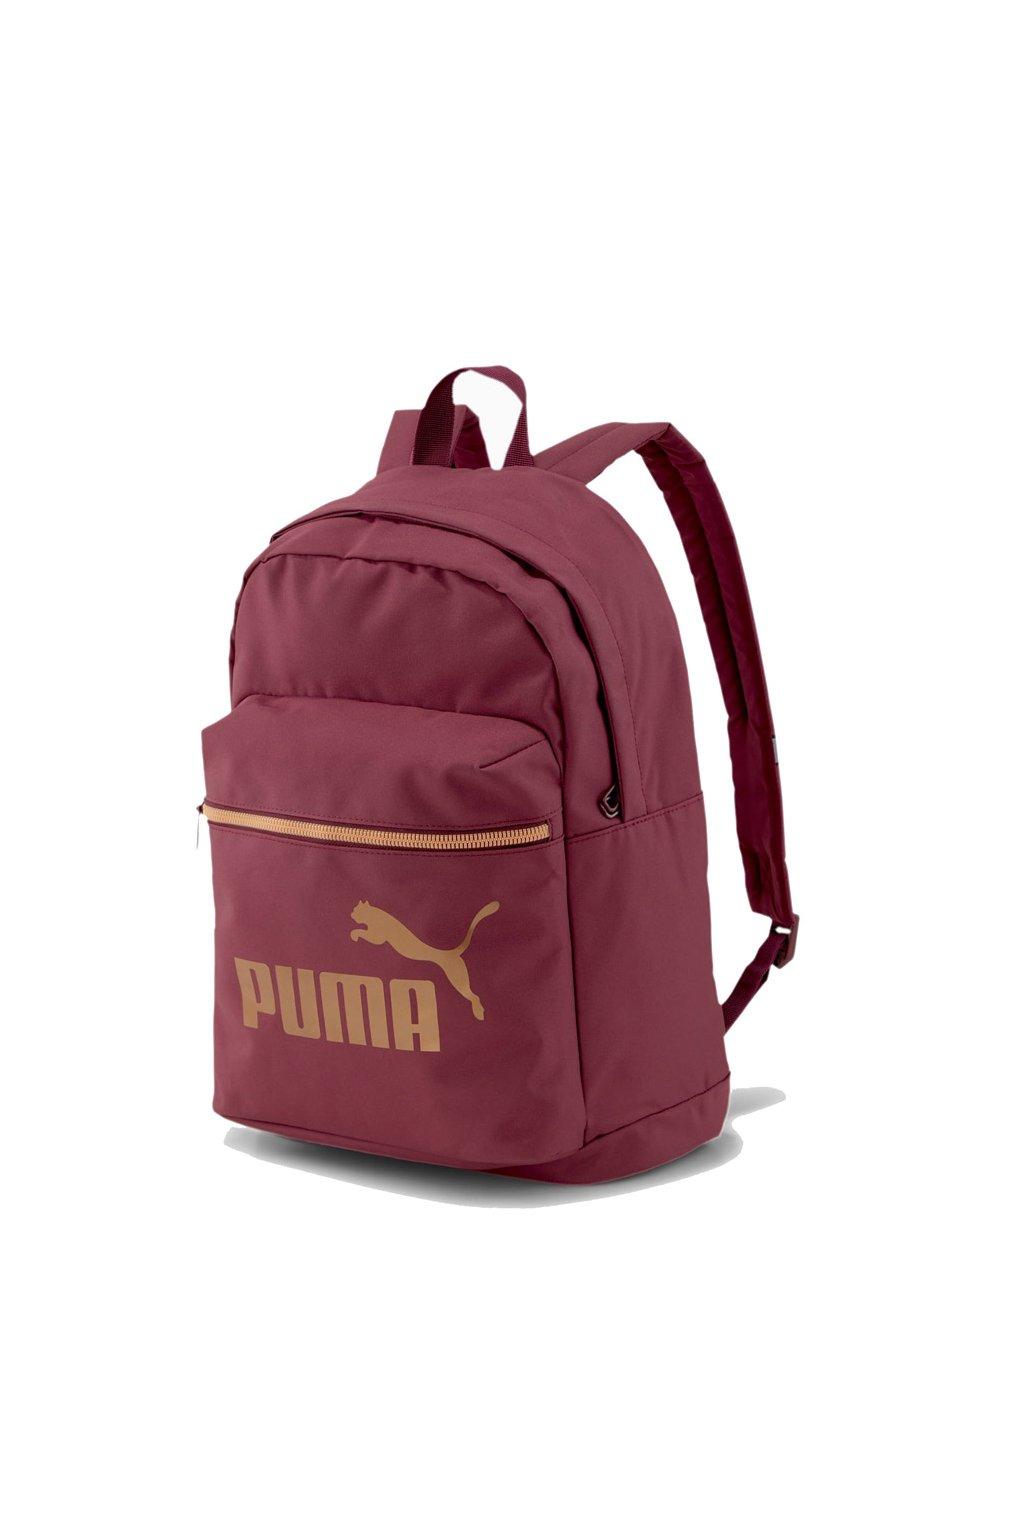 Batoh Puma WMN Core Base College Bag bordový 077374 04